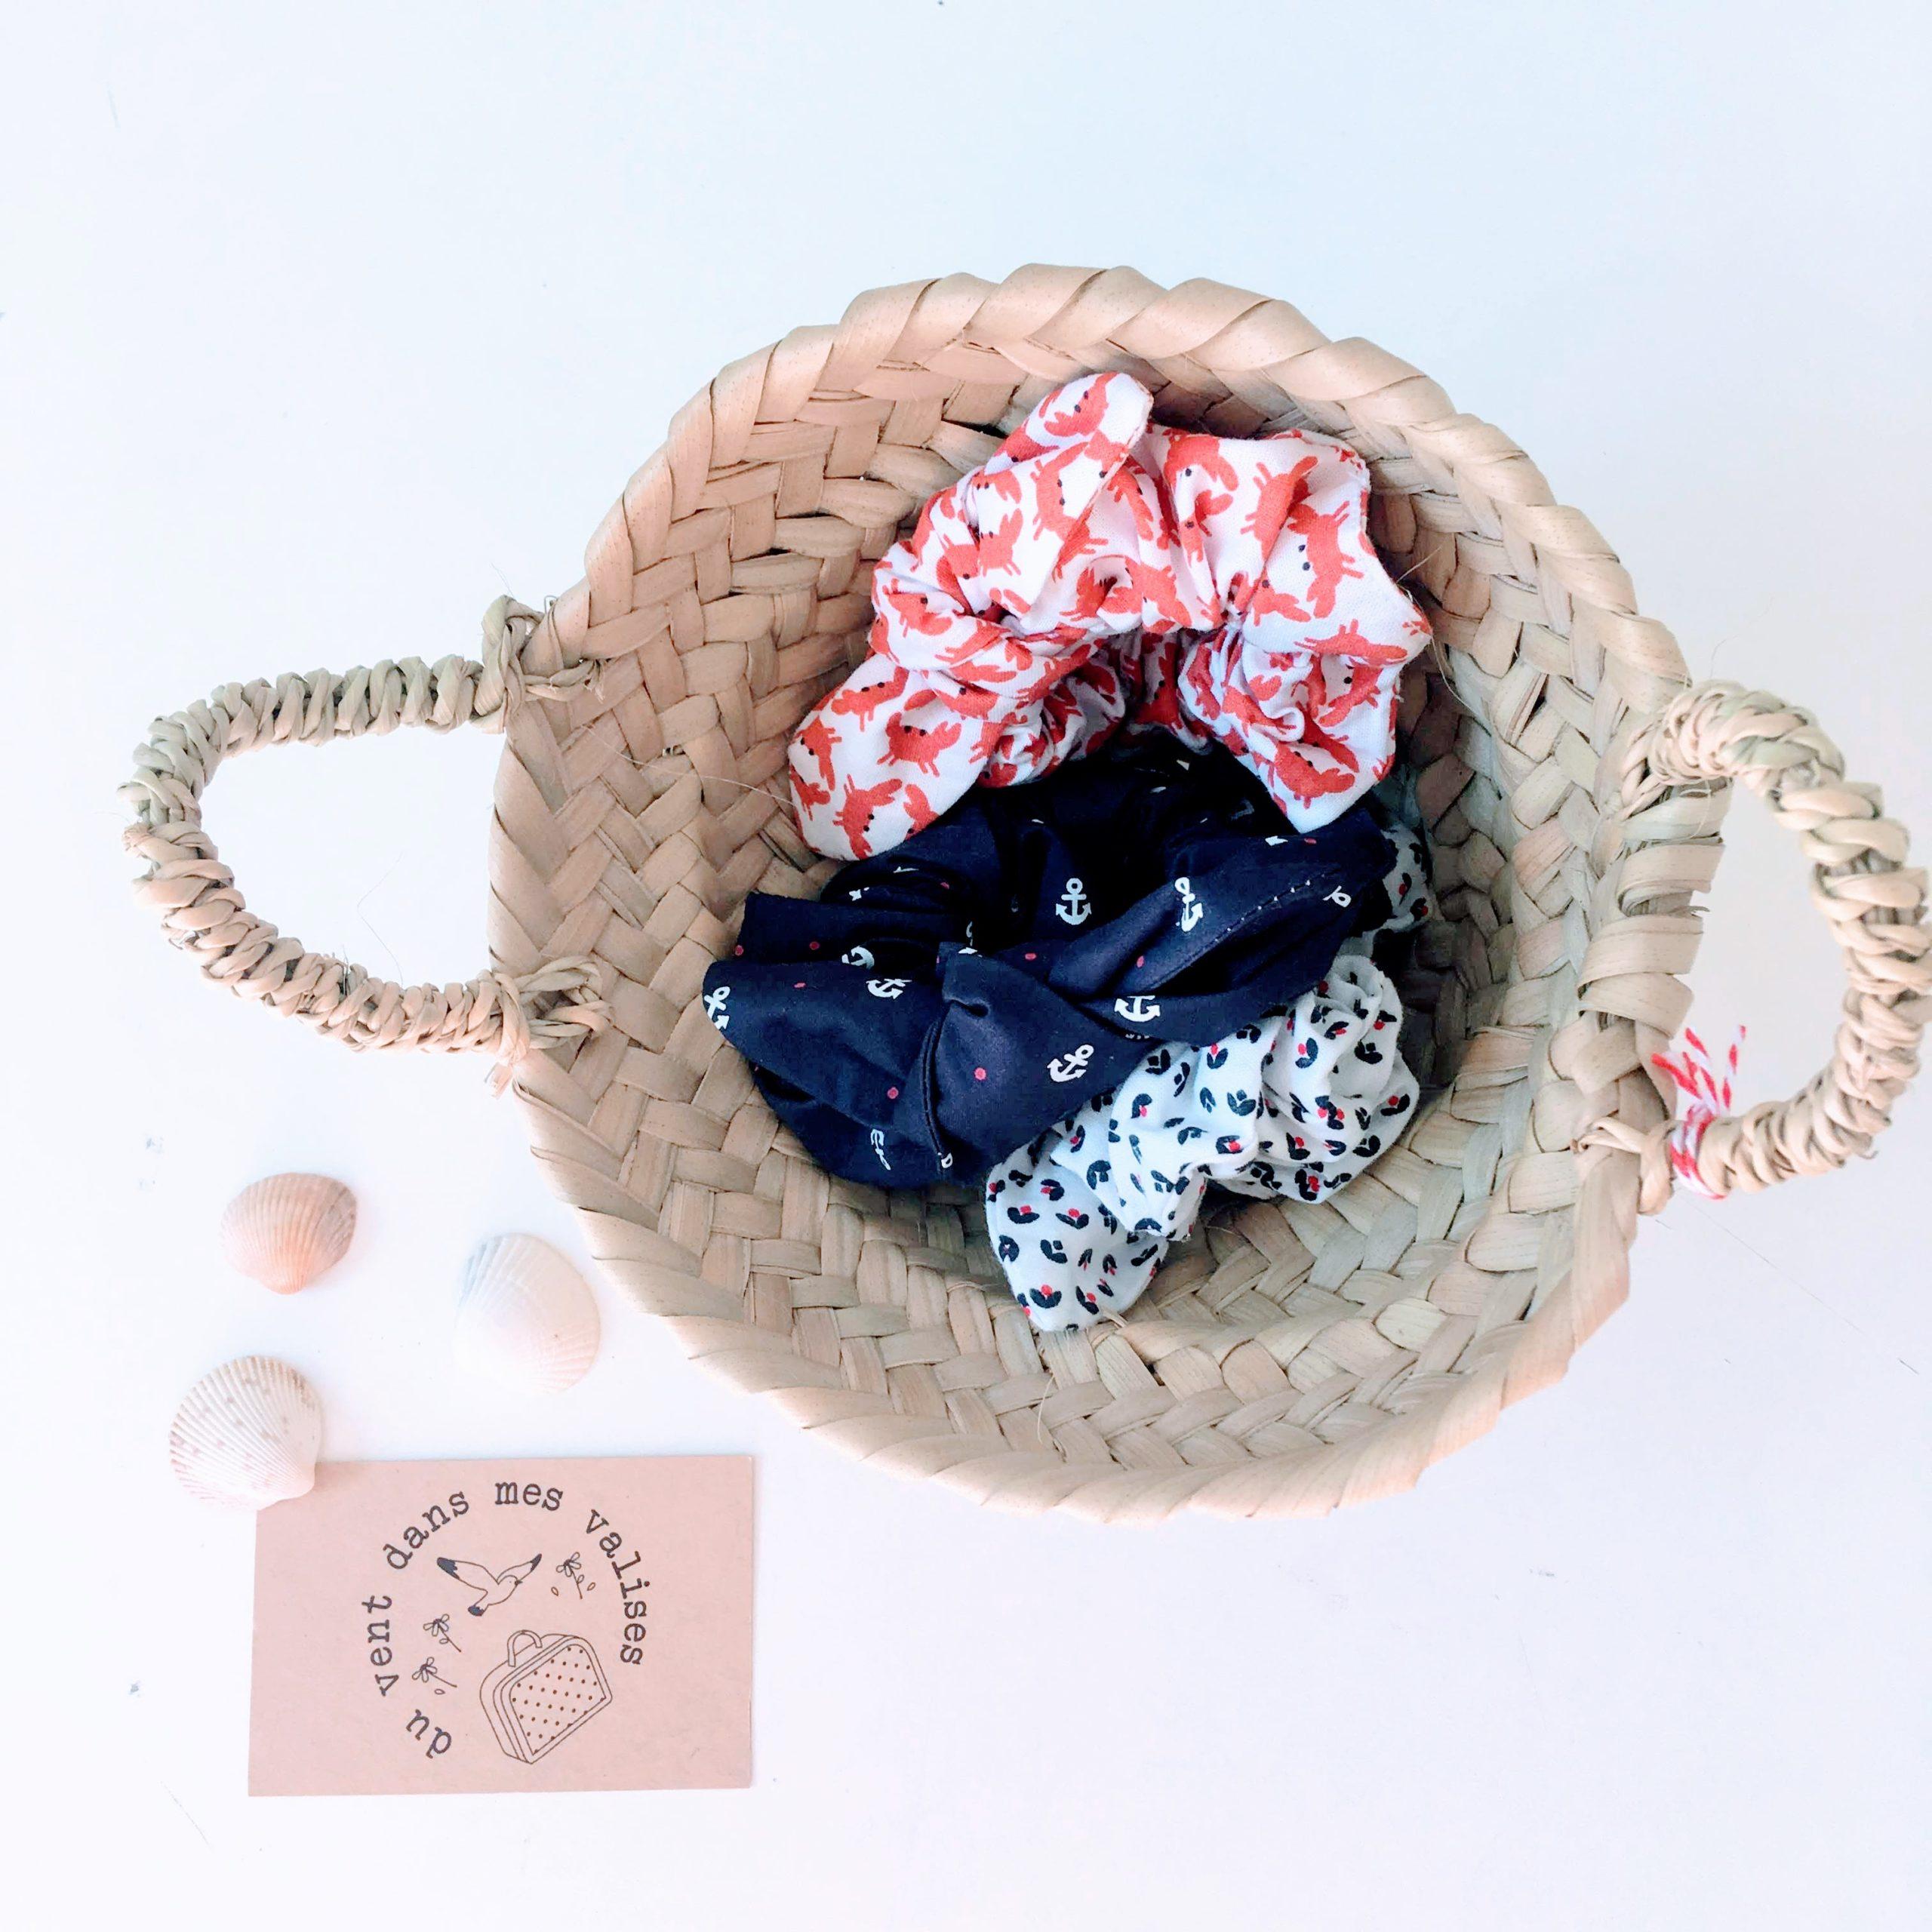 du vent dans mes valises - chouchou chou crabes made in France